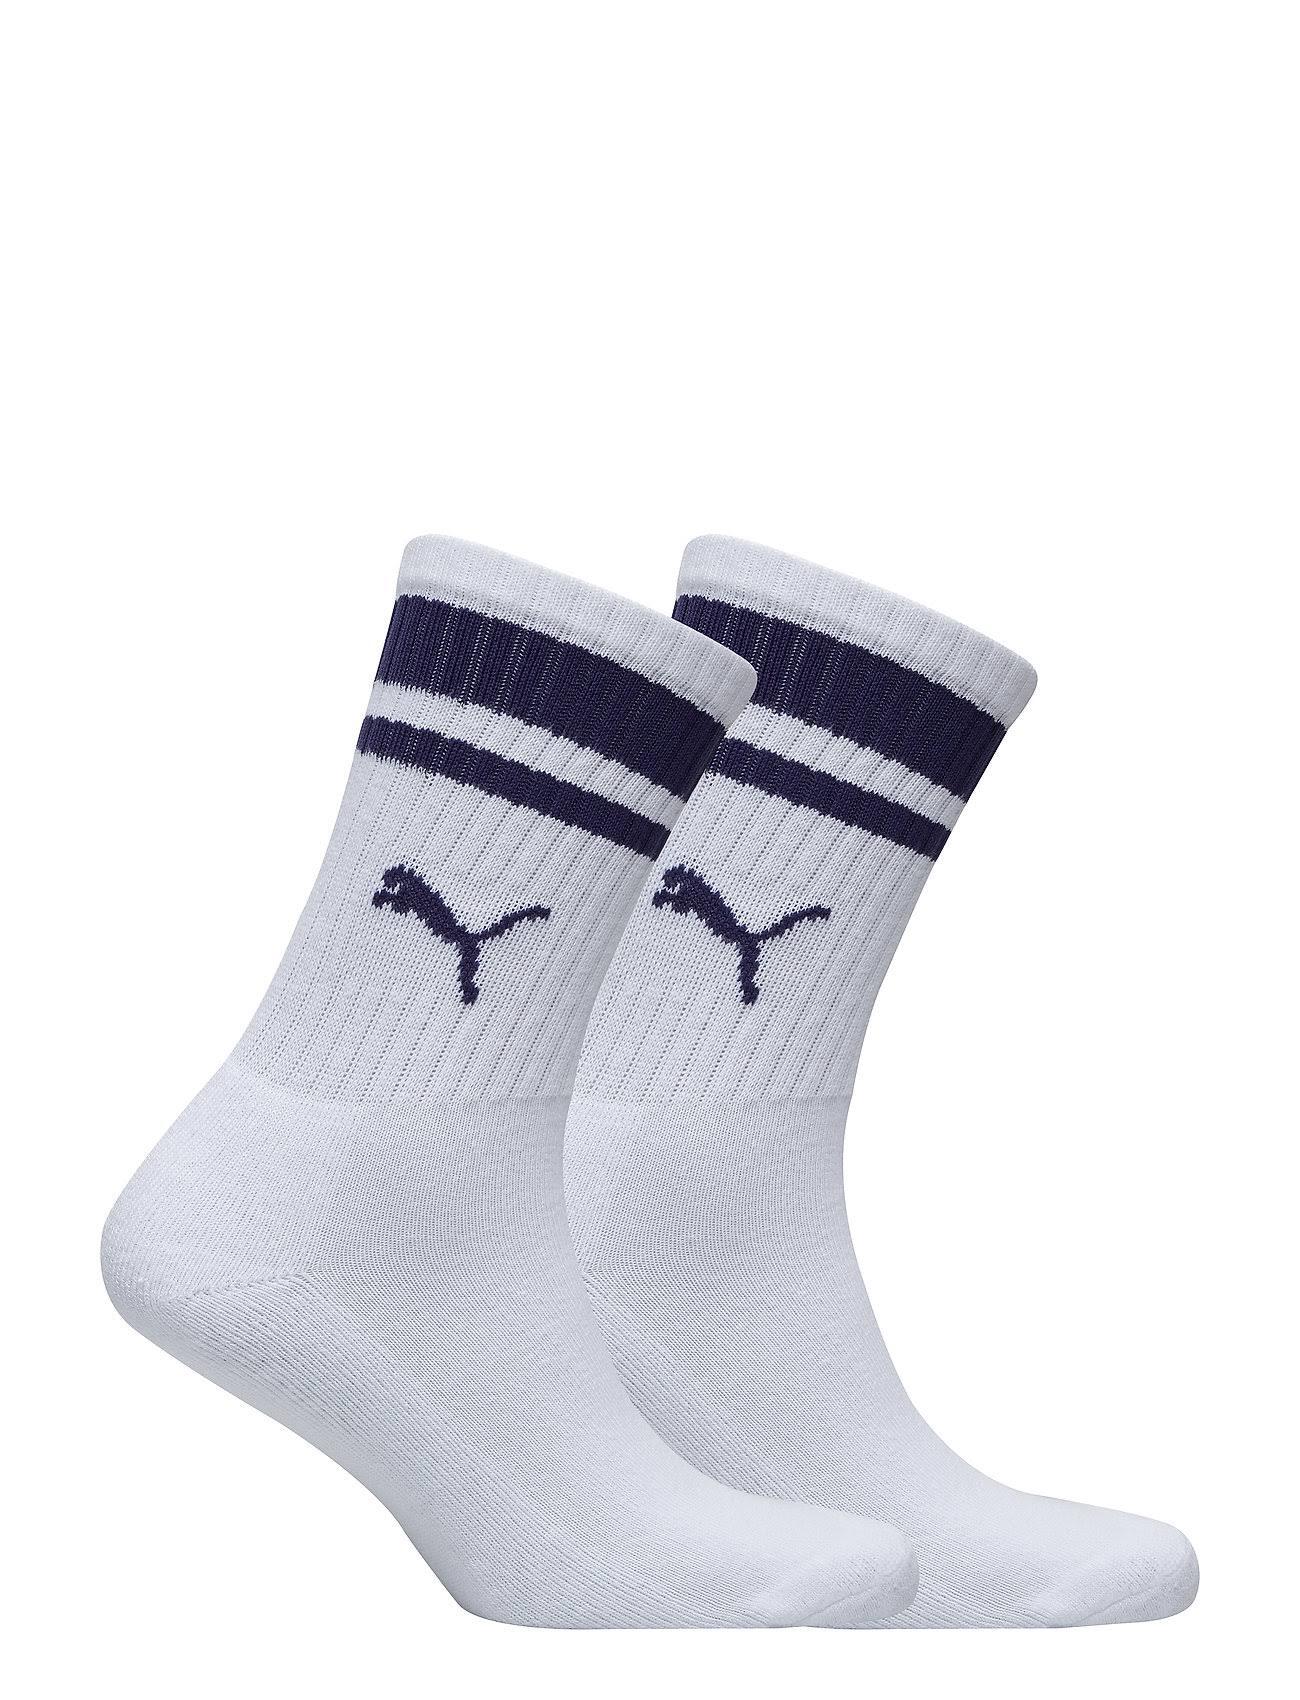 Puma 2-Pack of Heritage Stripe Socks, White. Man 39-42